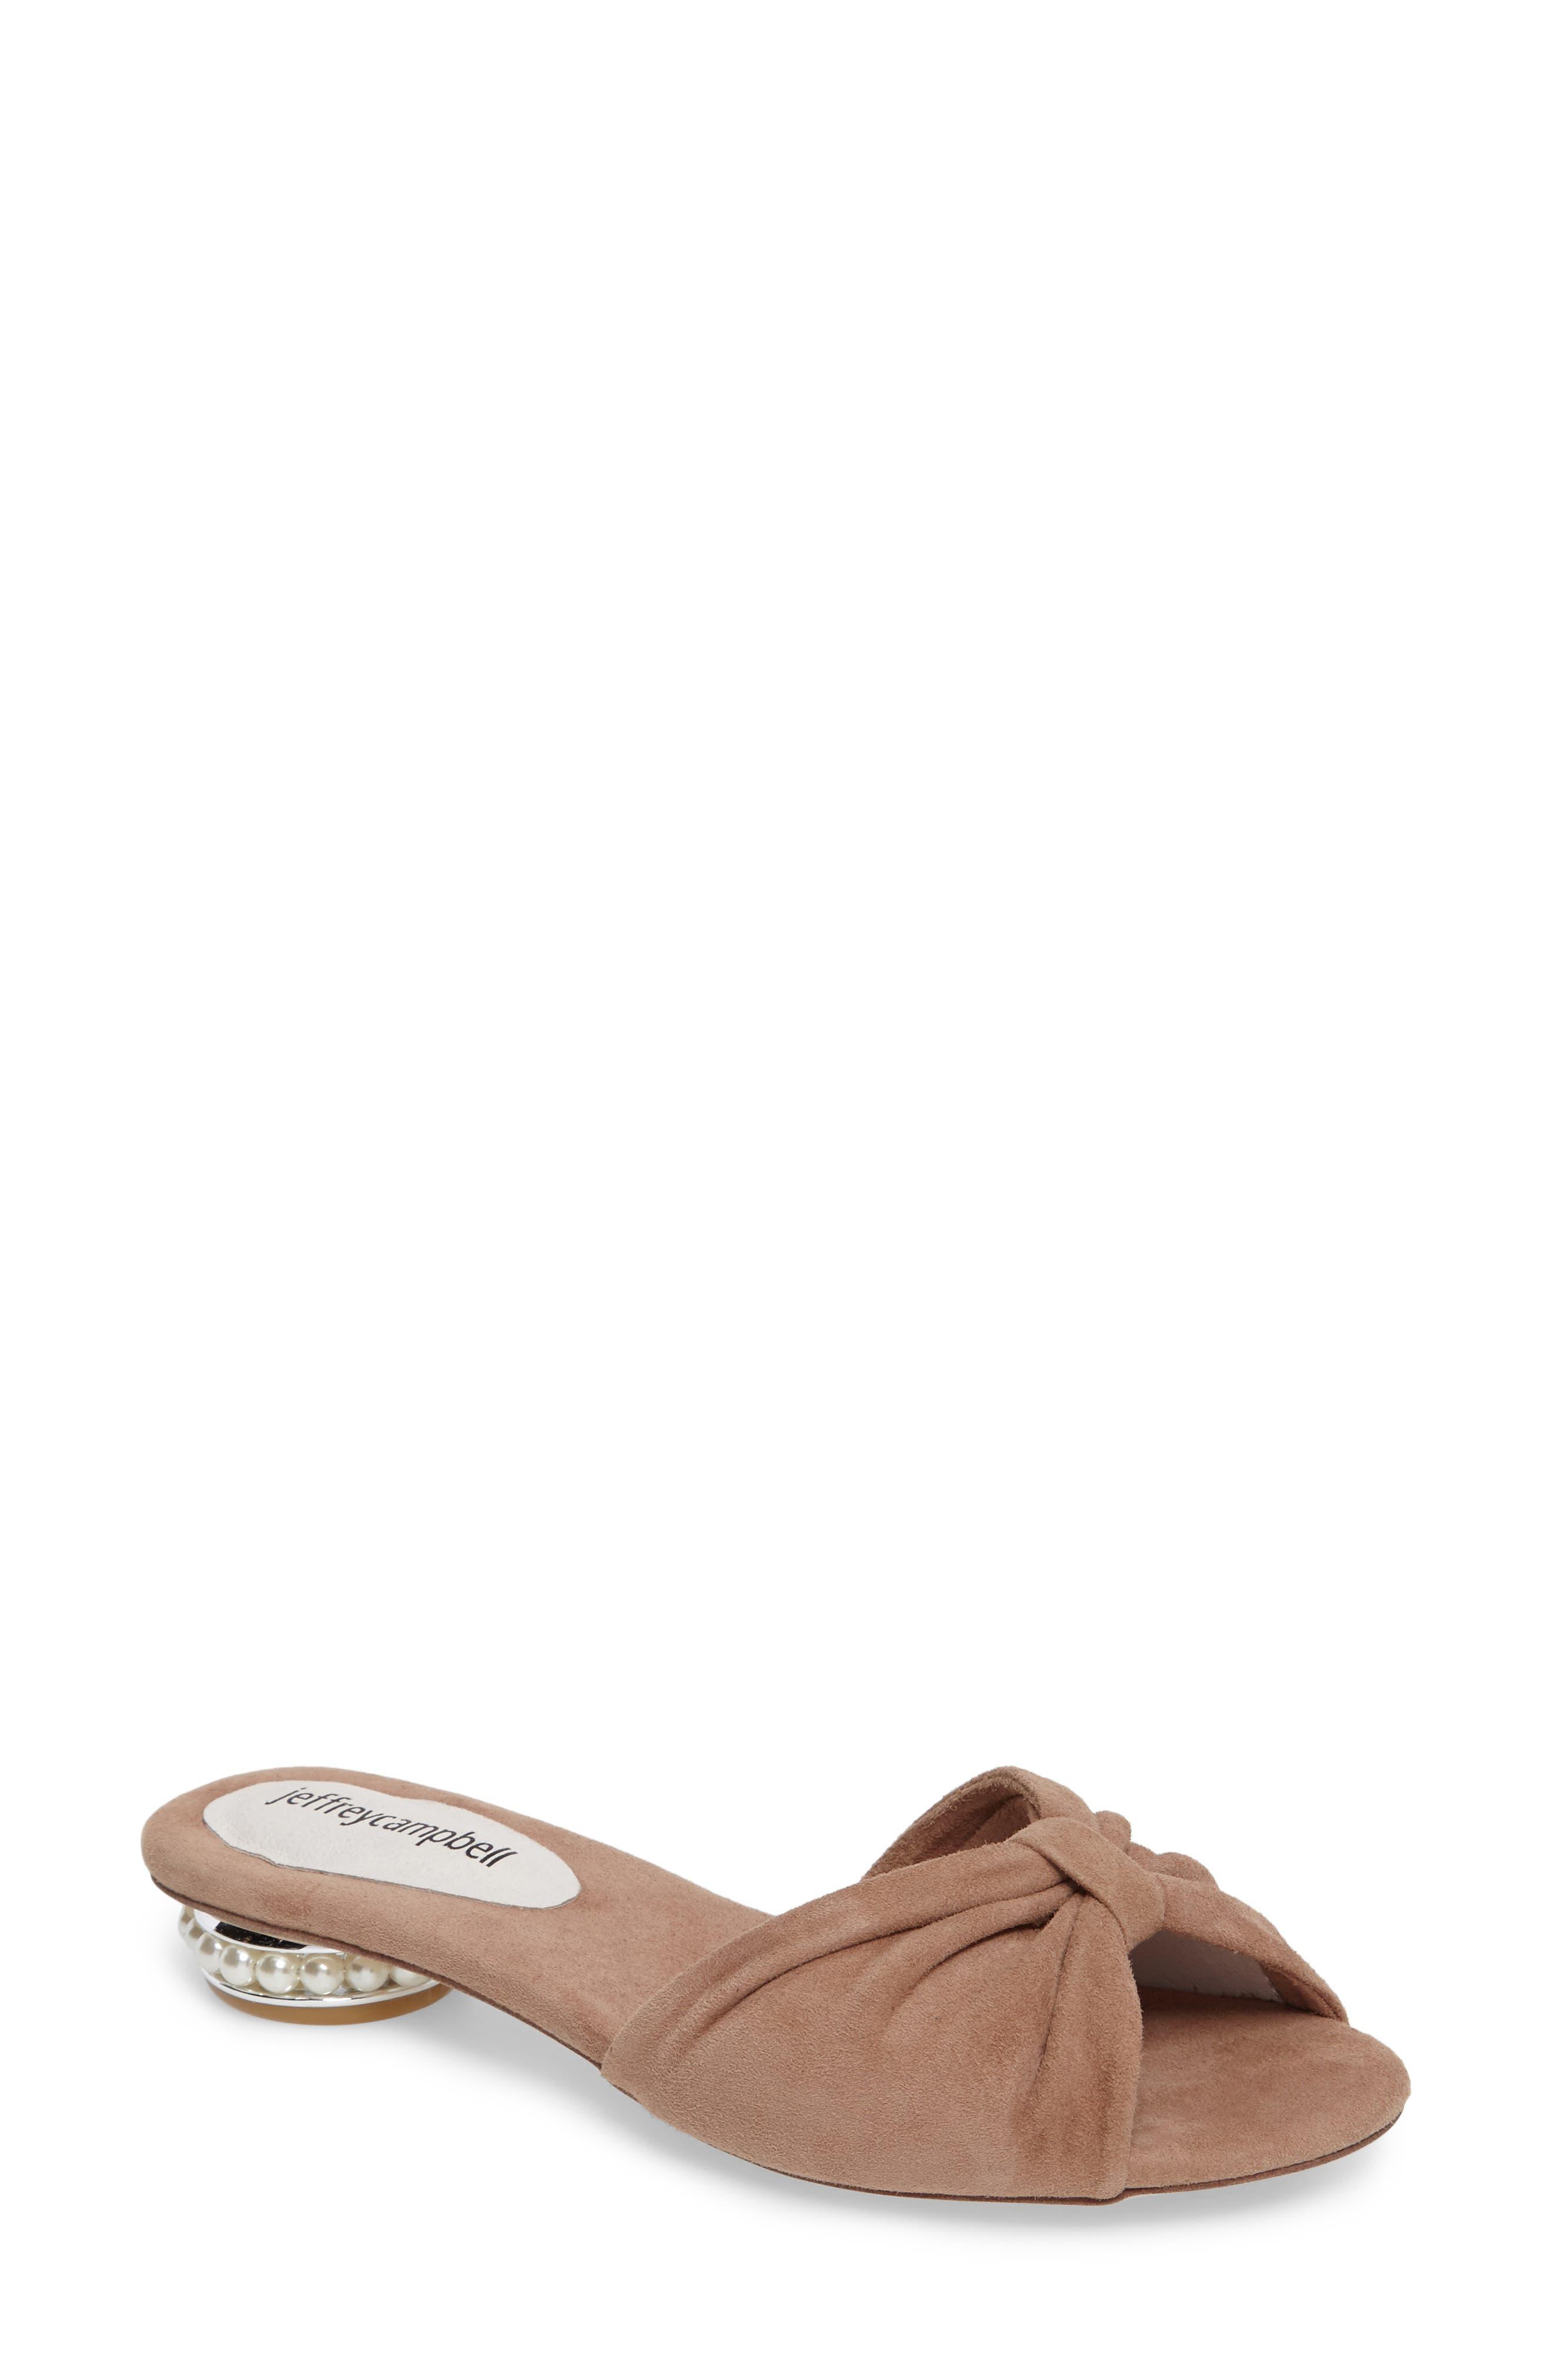 Main Image - Jeffrey Campbell Turbina Embellished Slide Sandal (Women)